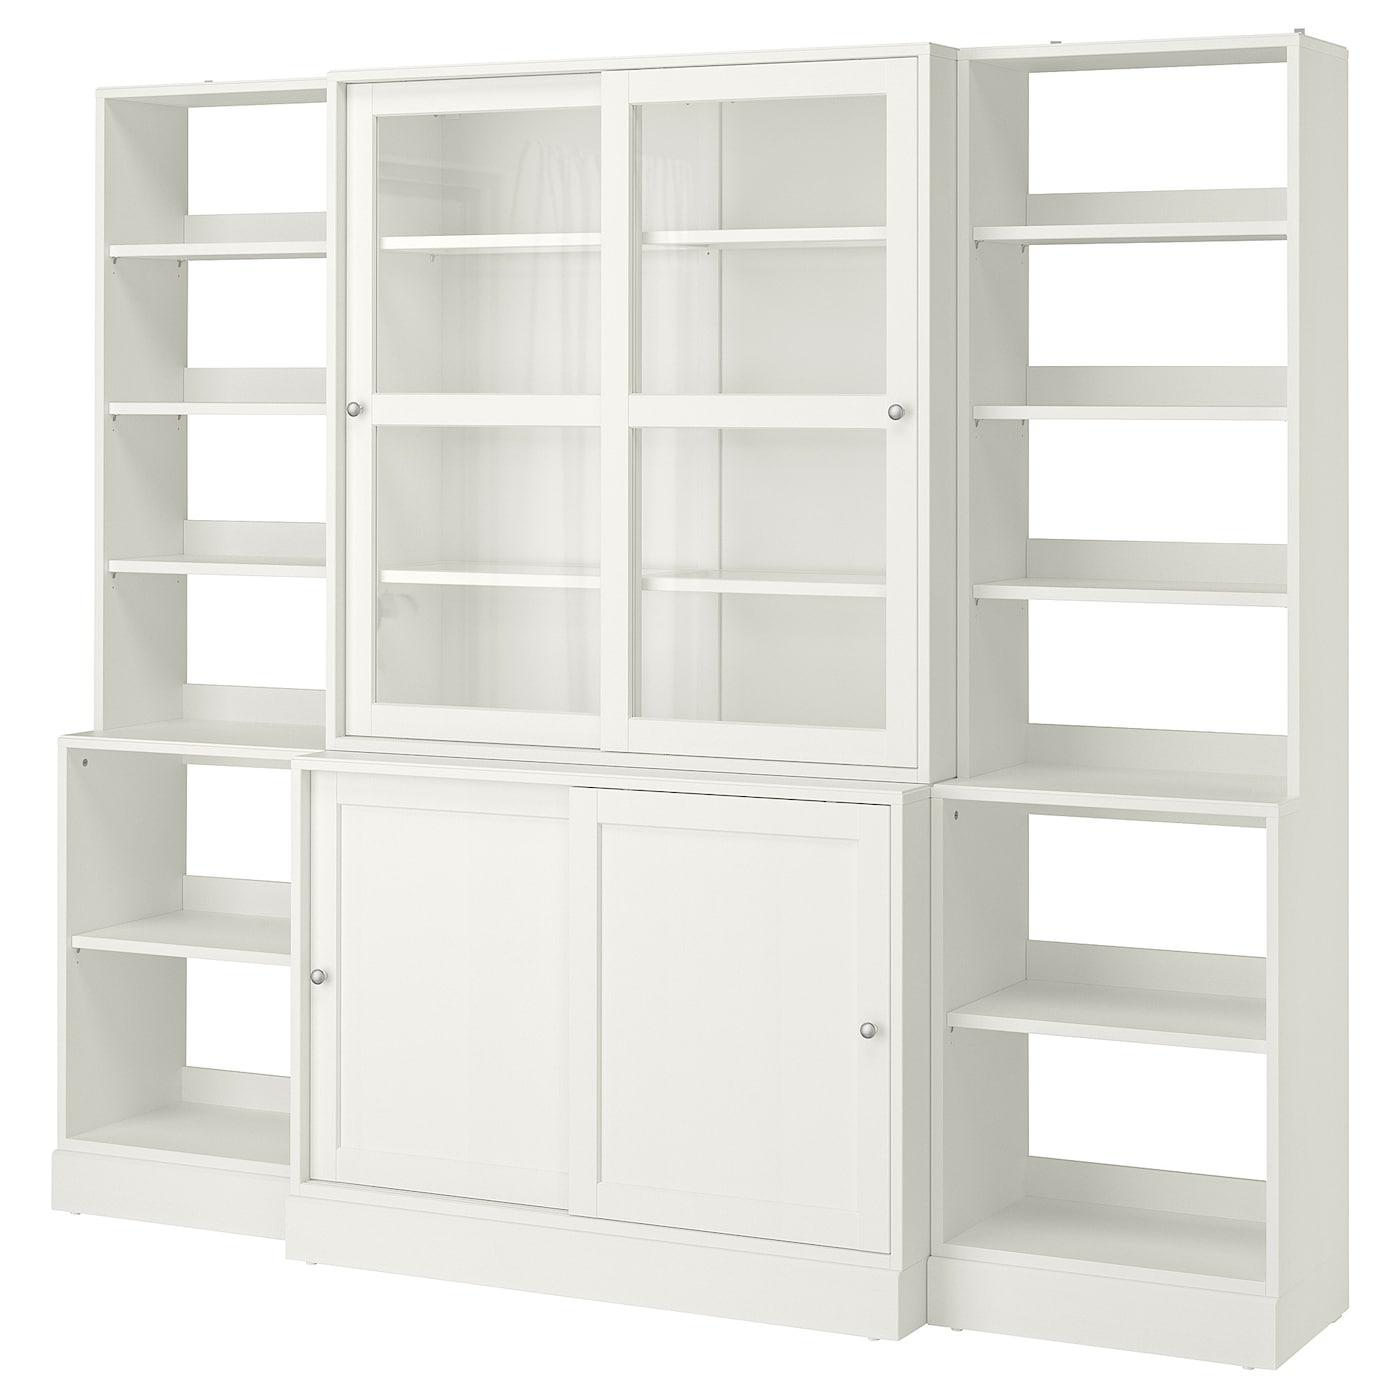 HAVSTA Storage With Sliding Glass Doors